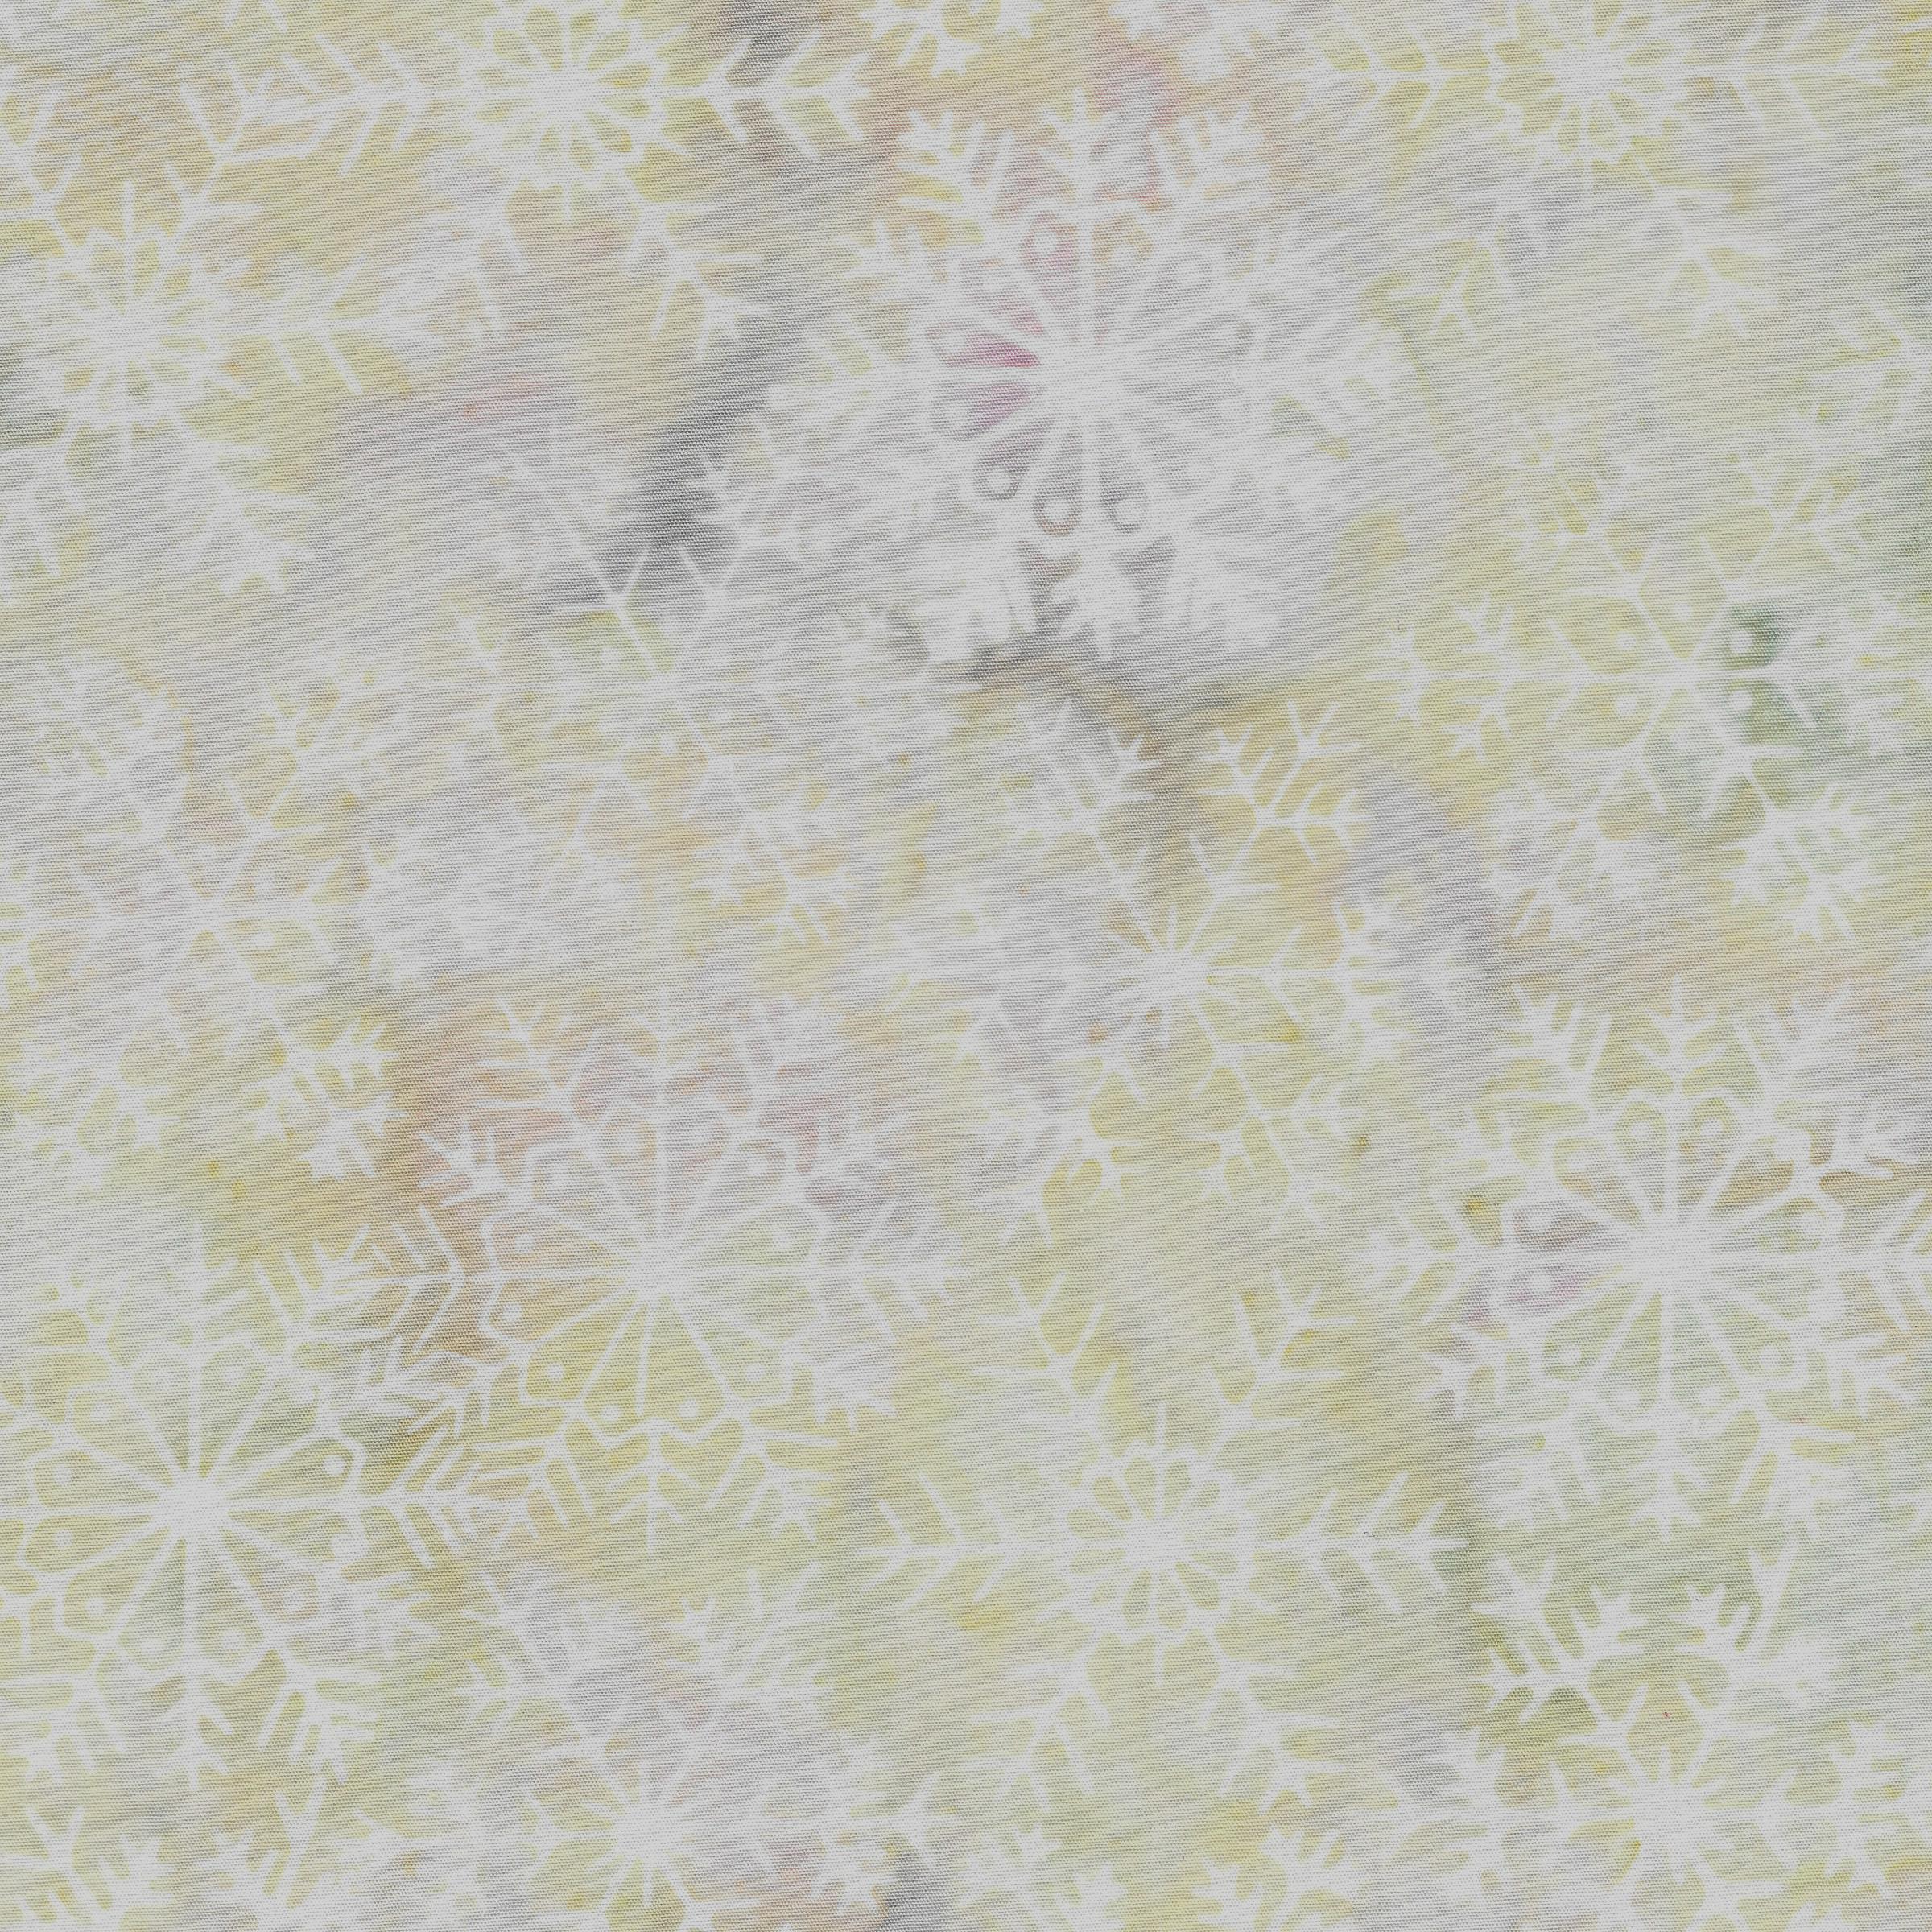 Island Batik-Lg. Snowflake